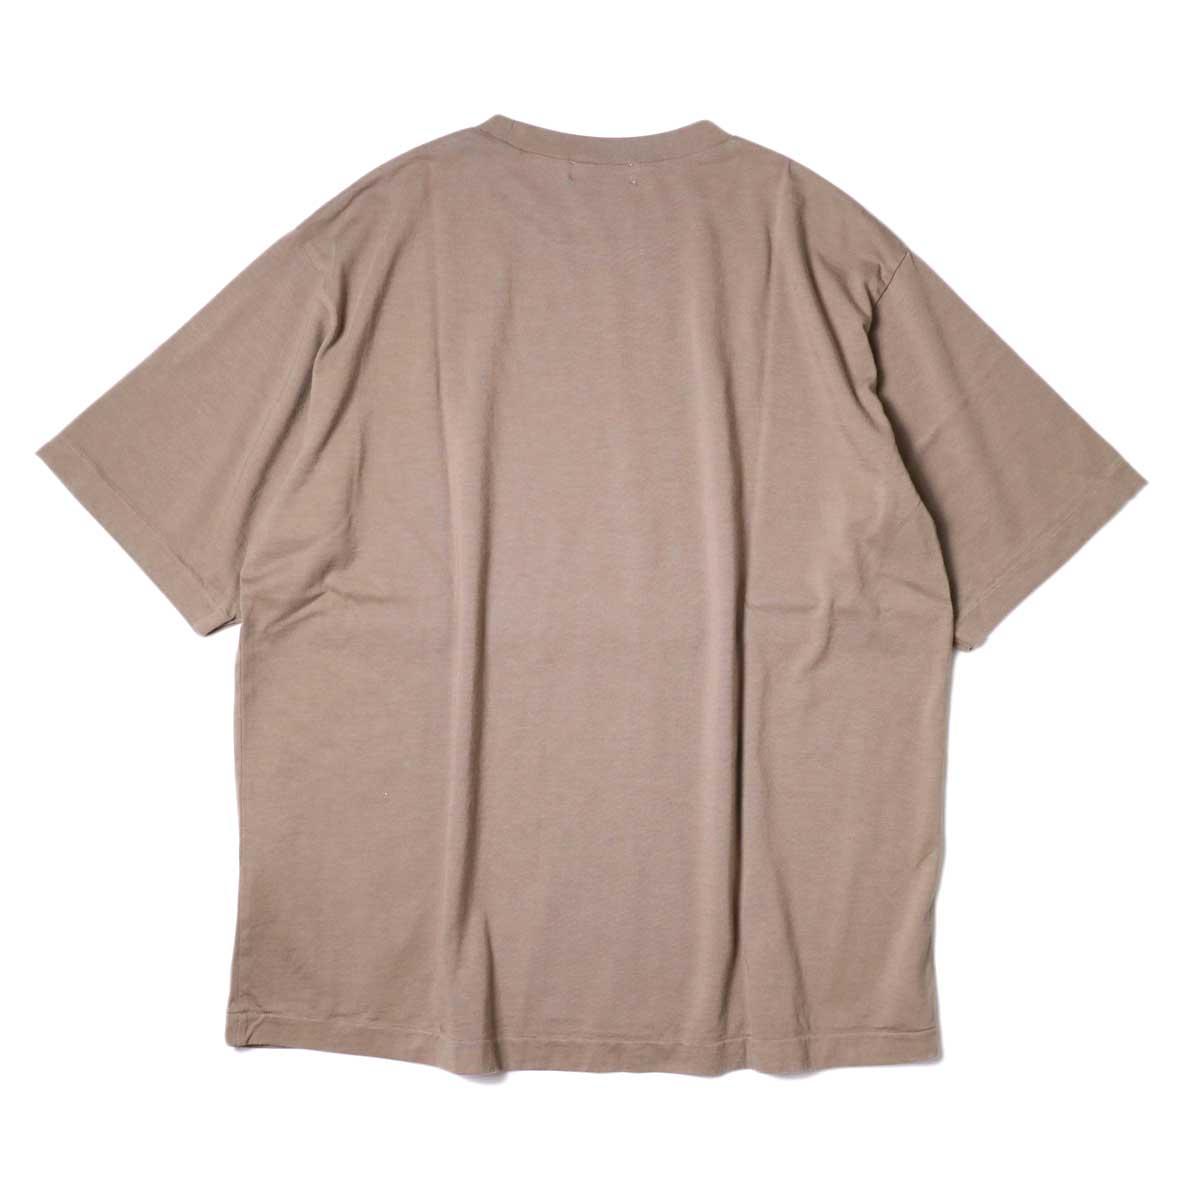 alvana / Dairy Oversize Tee Shirts (Sunset Beige) 背面